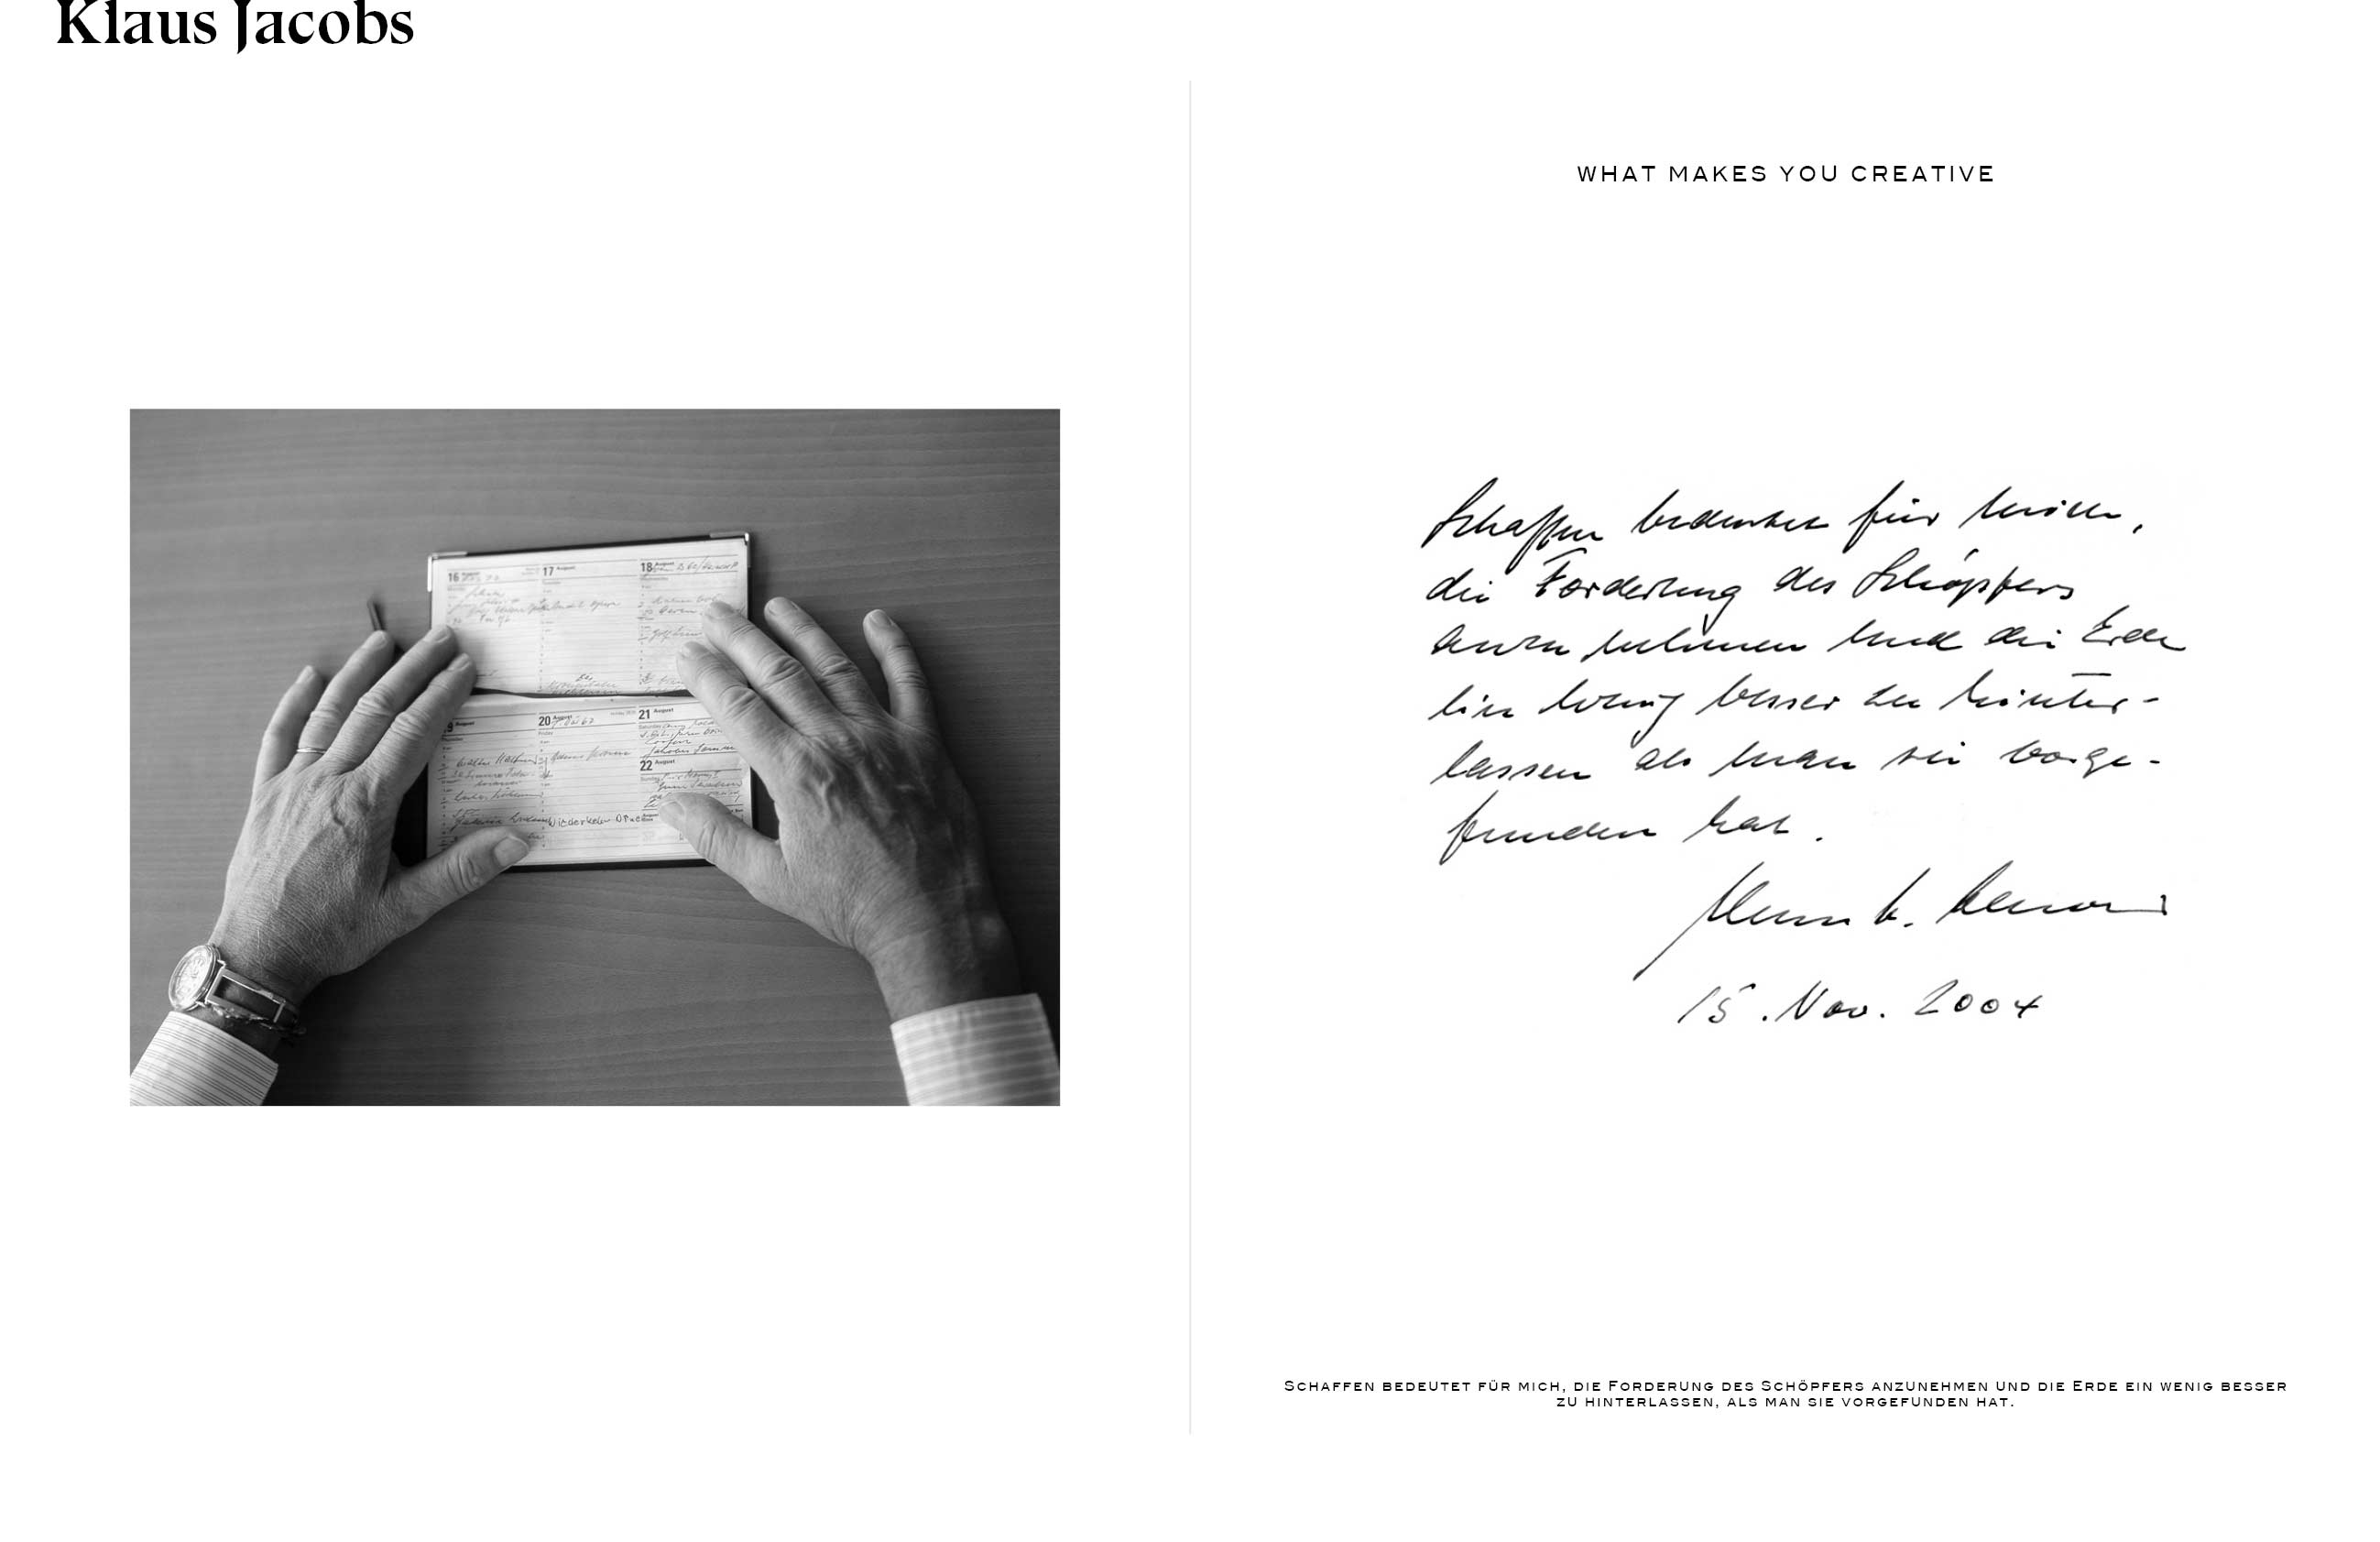 Klaus Jacobs, his hands and handwriting - FRANCO TETTAMANTI